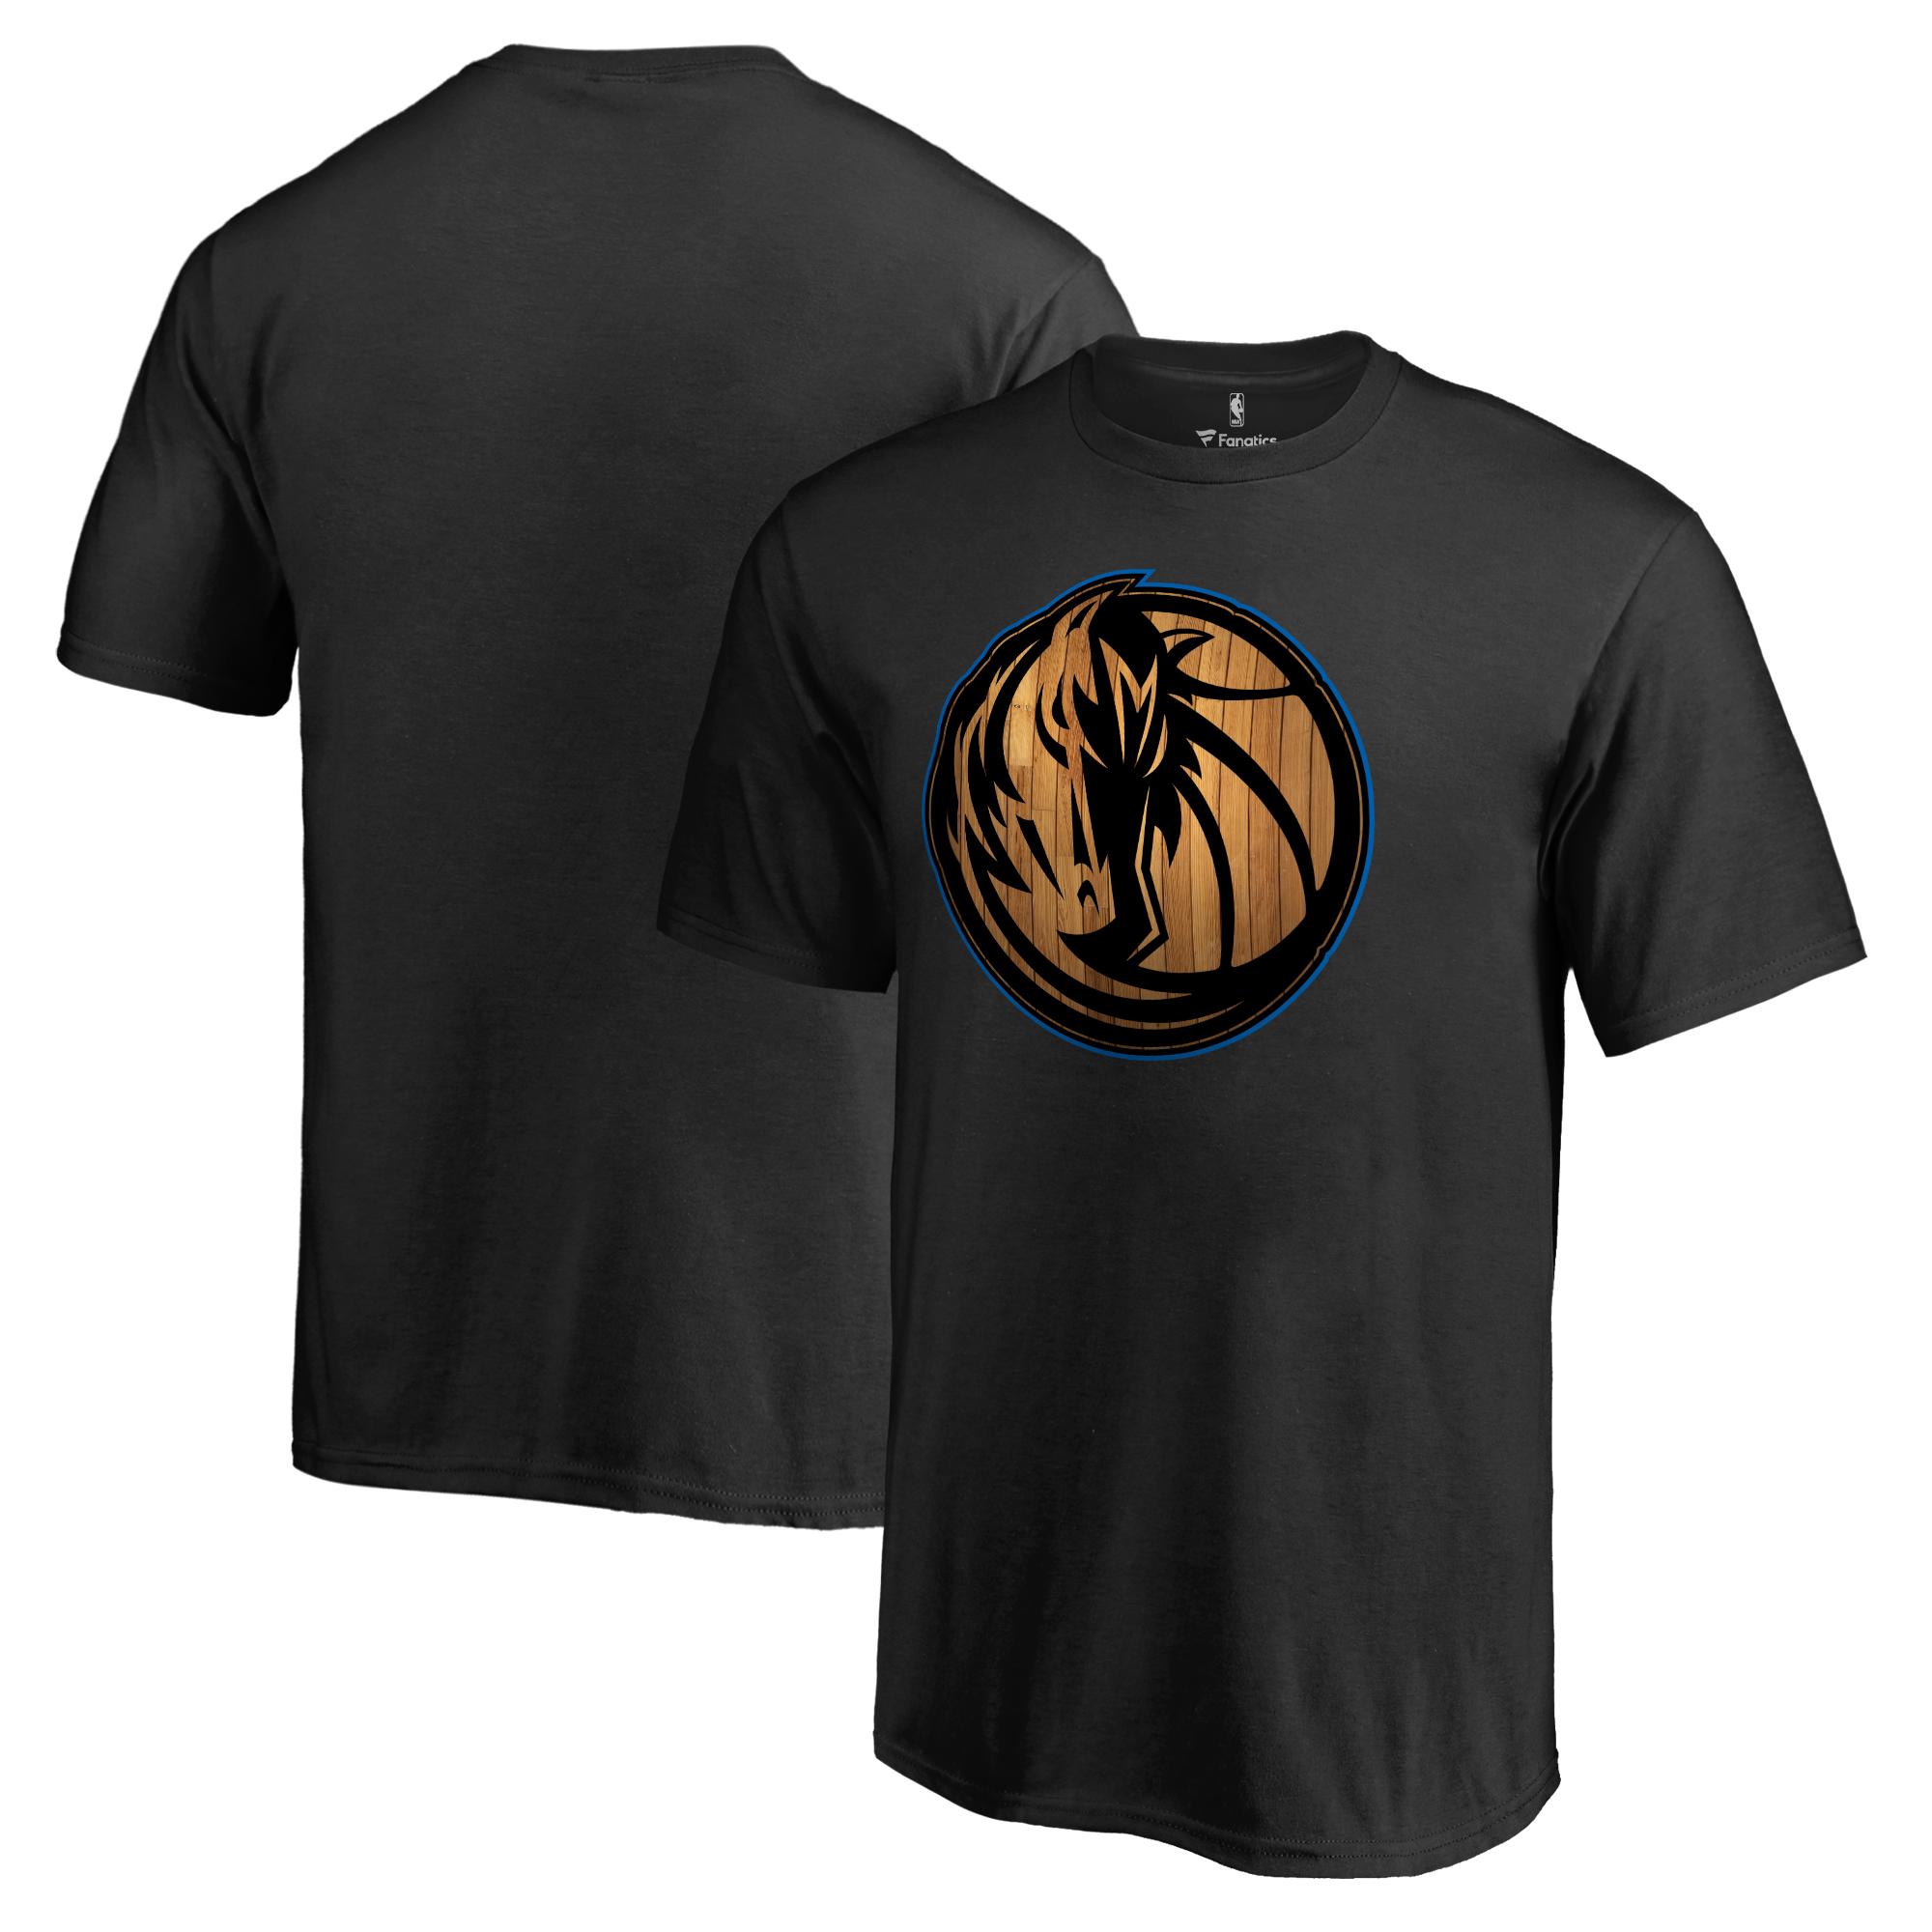 Dallas Mavericks Youth Hardwood T-Shirt - Black